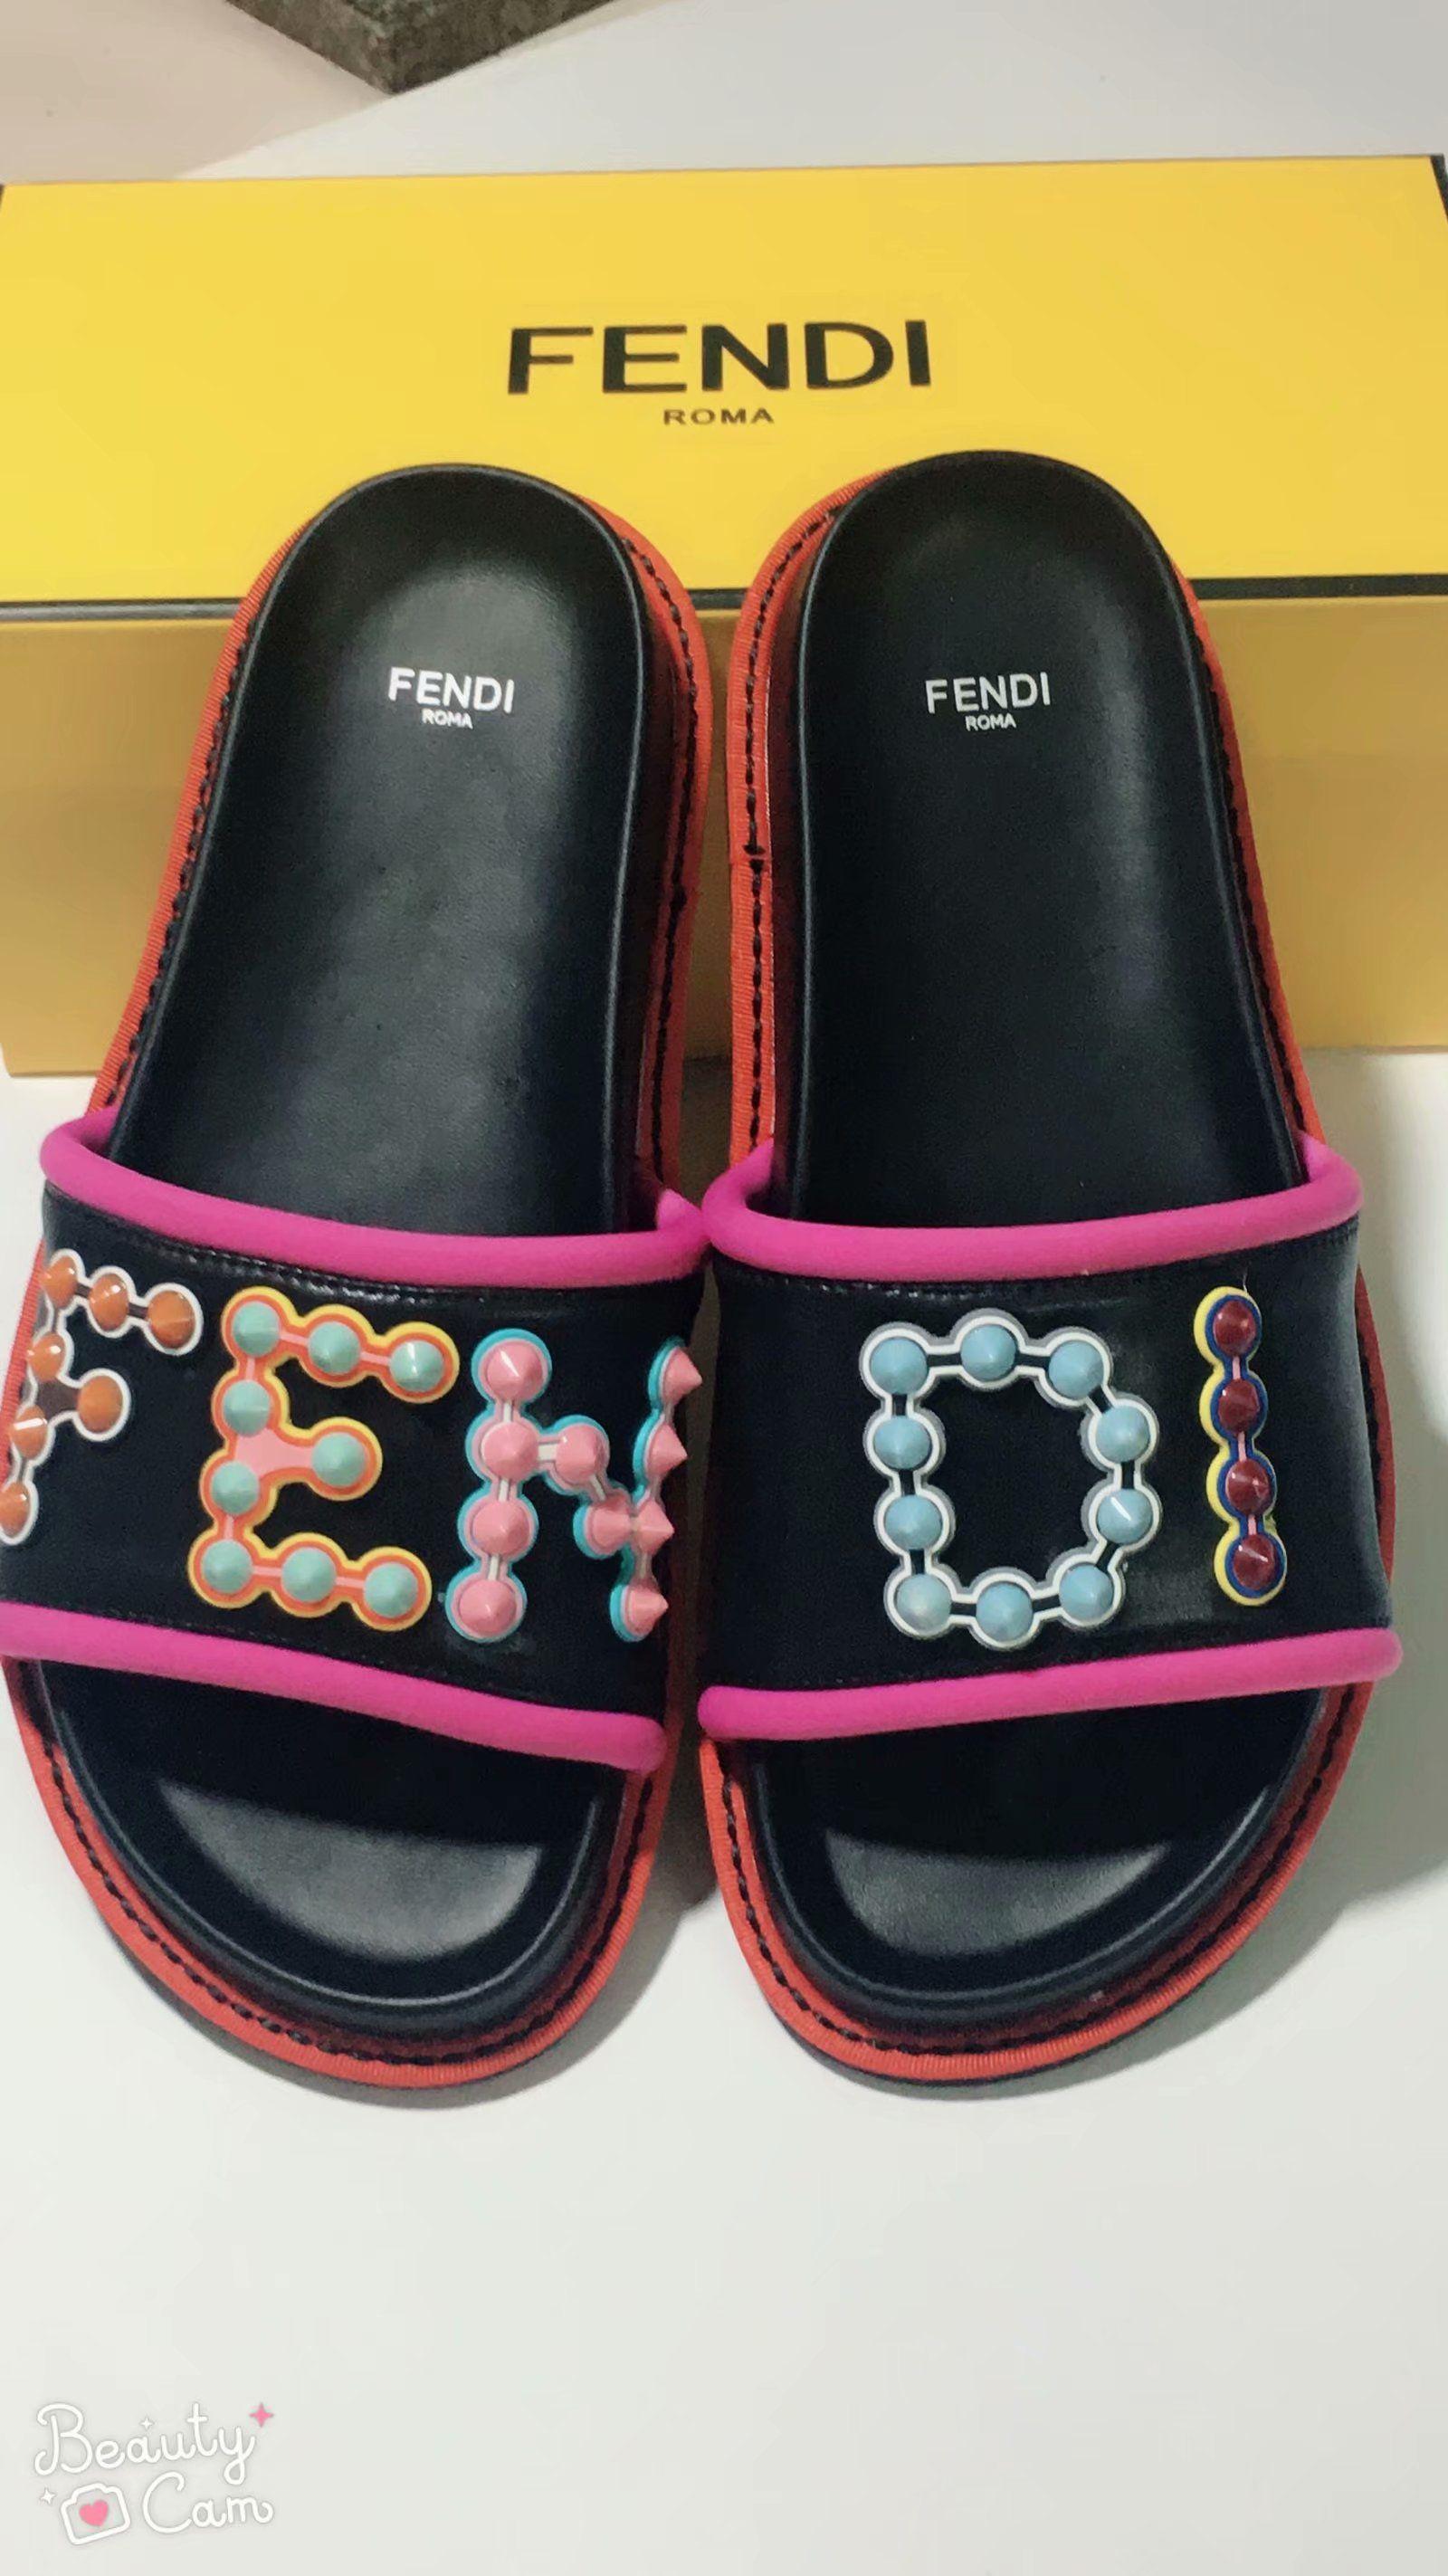 2020 NUOVA pantofola ingranaggi battuta mens strisce sandali causali antiscivolo huaraches estivi ciabatte infradito pantofola MIGLIORE QUALITÀ 35-45